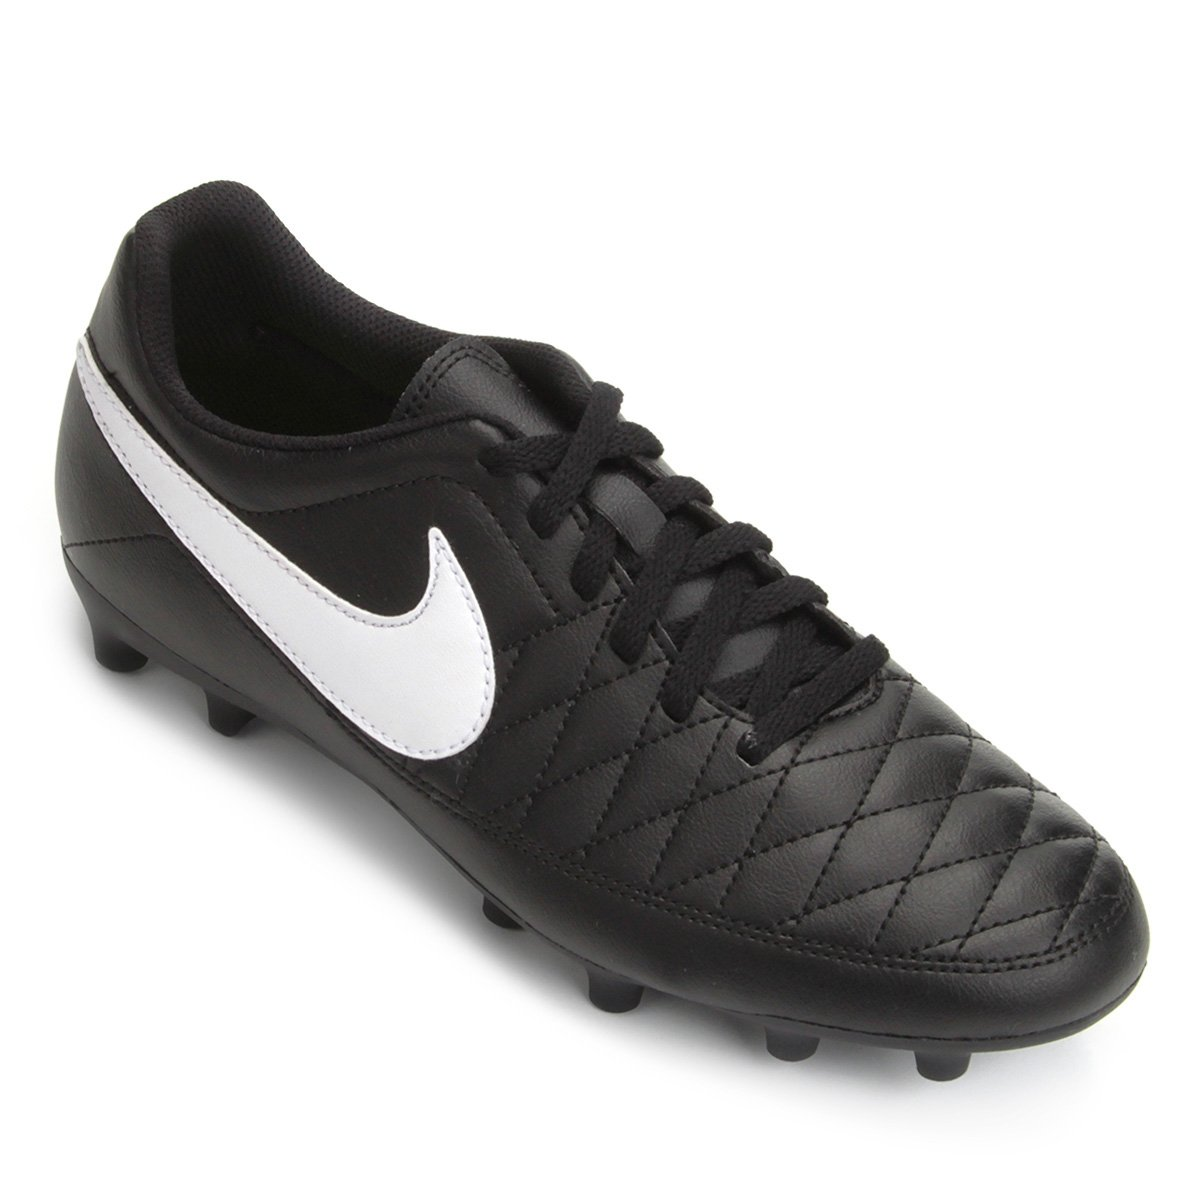 e8c0716708 Chuteira Campo Nike Majestry FG - Preto